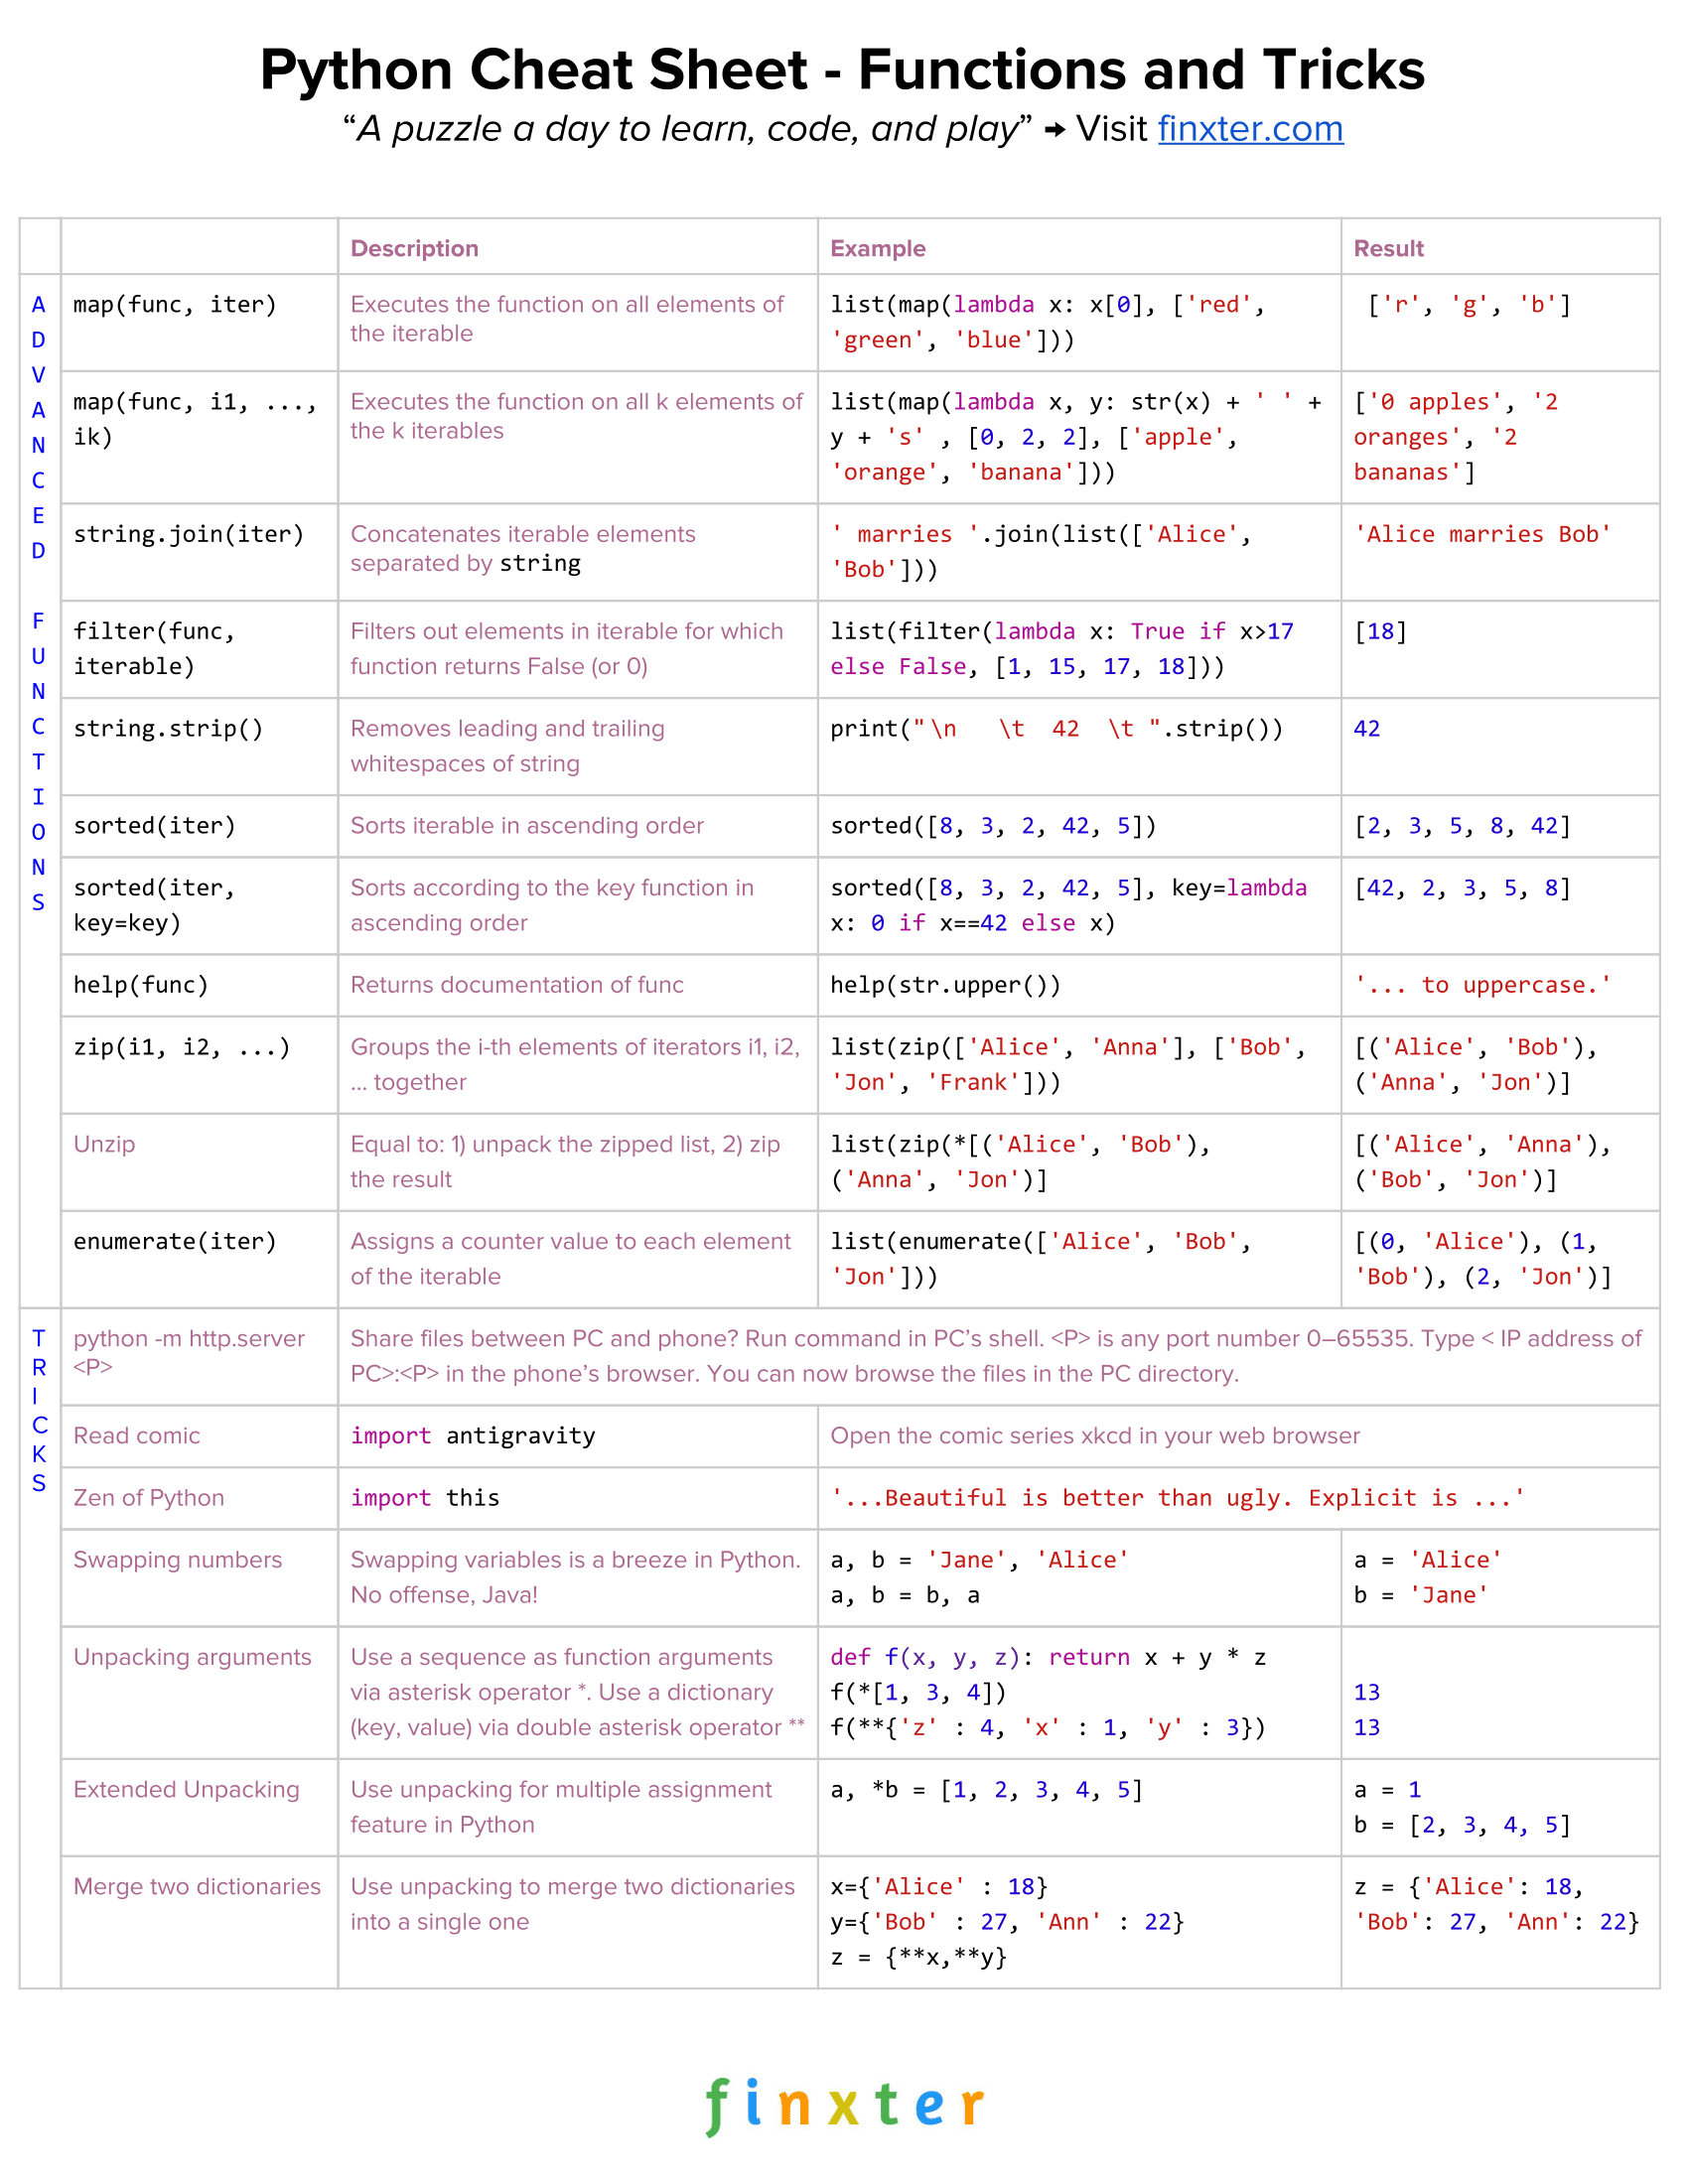 CheatSheet Python 5 - Functions and Tricks